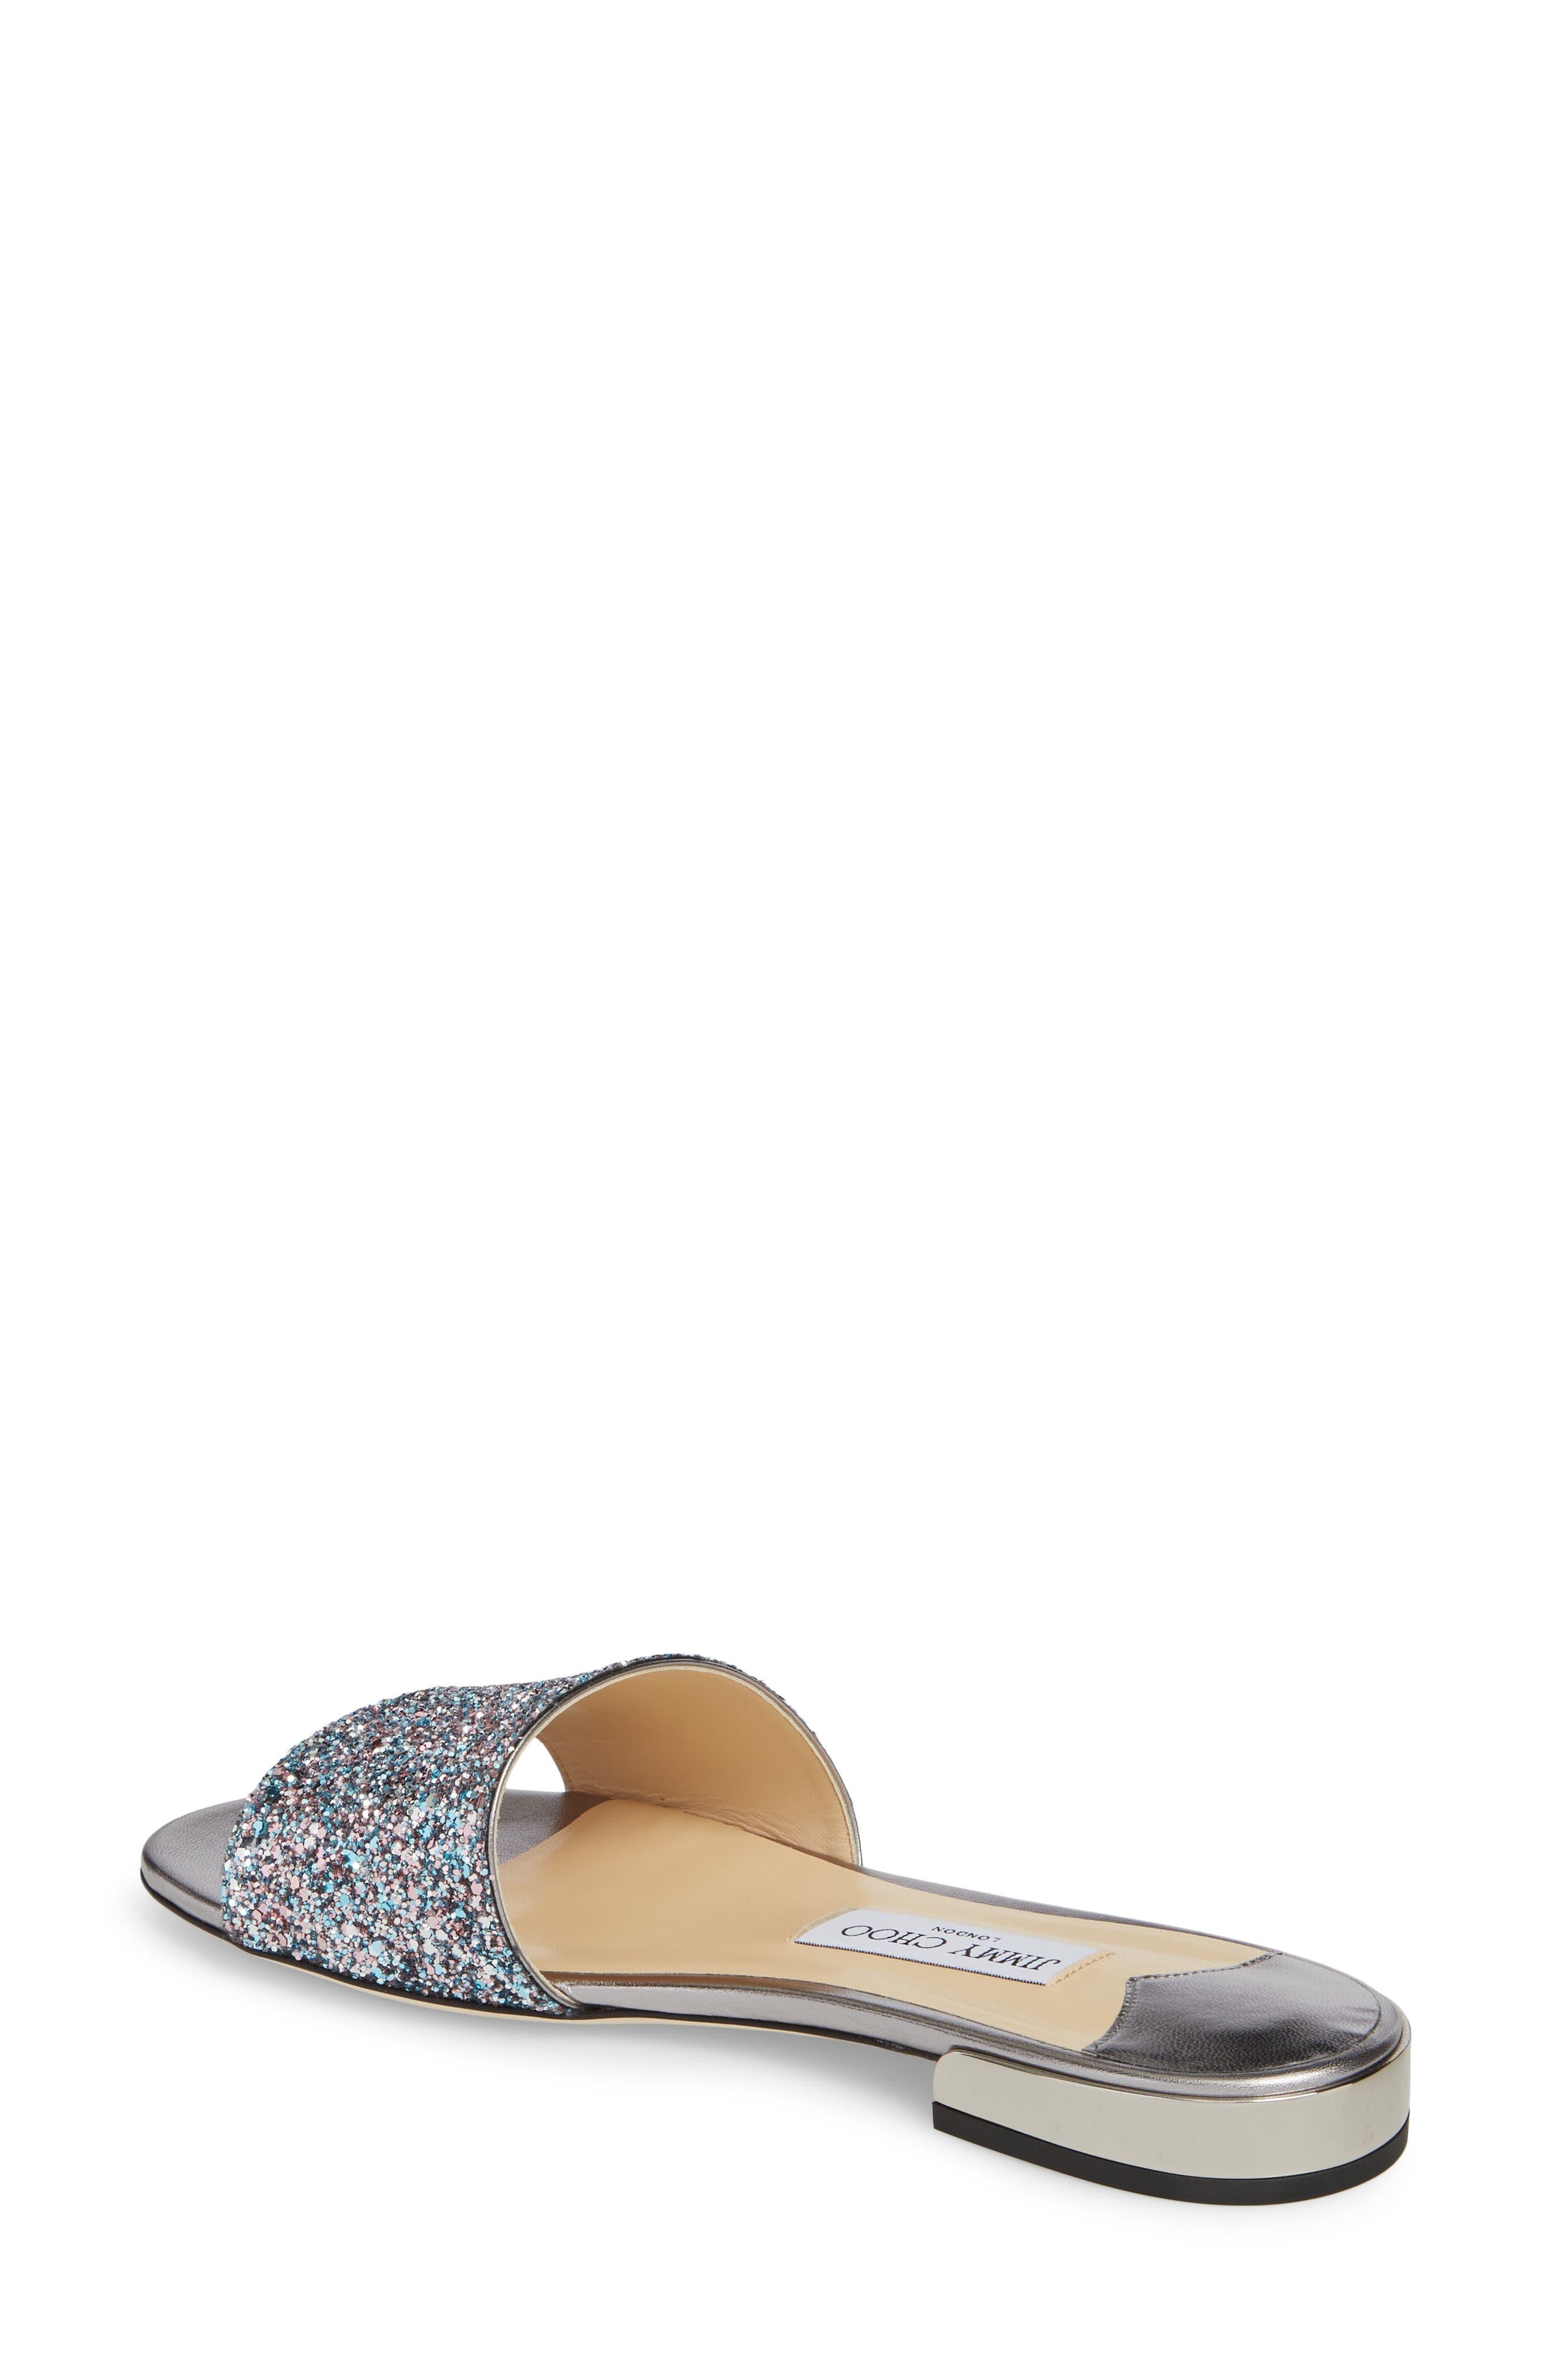 Joni Embellished Slide Sandal,                             Alternate thumbnail 2, color,                             Blush Silver